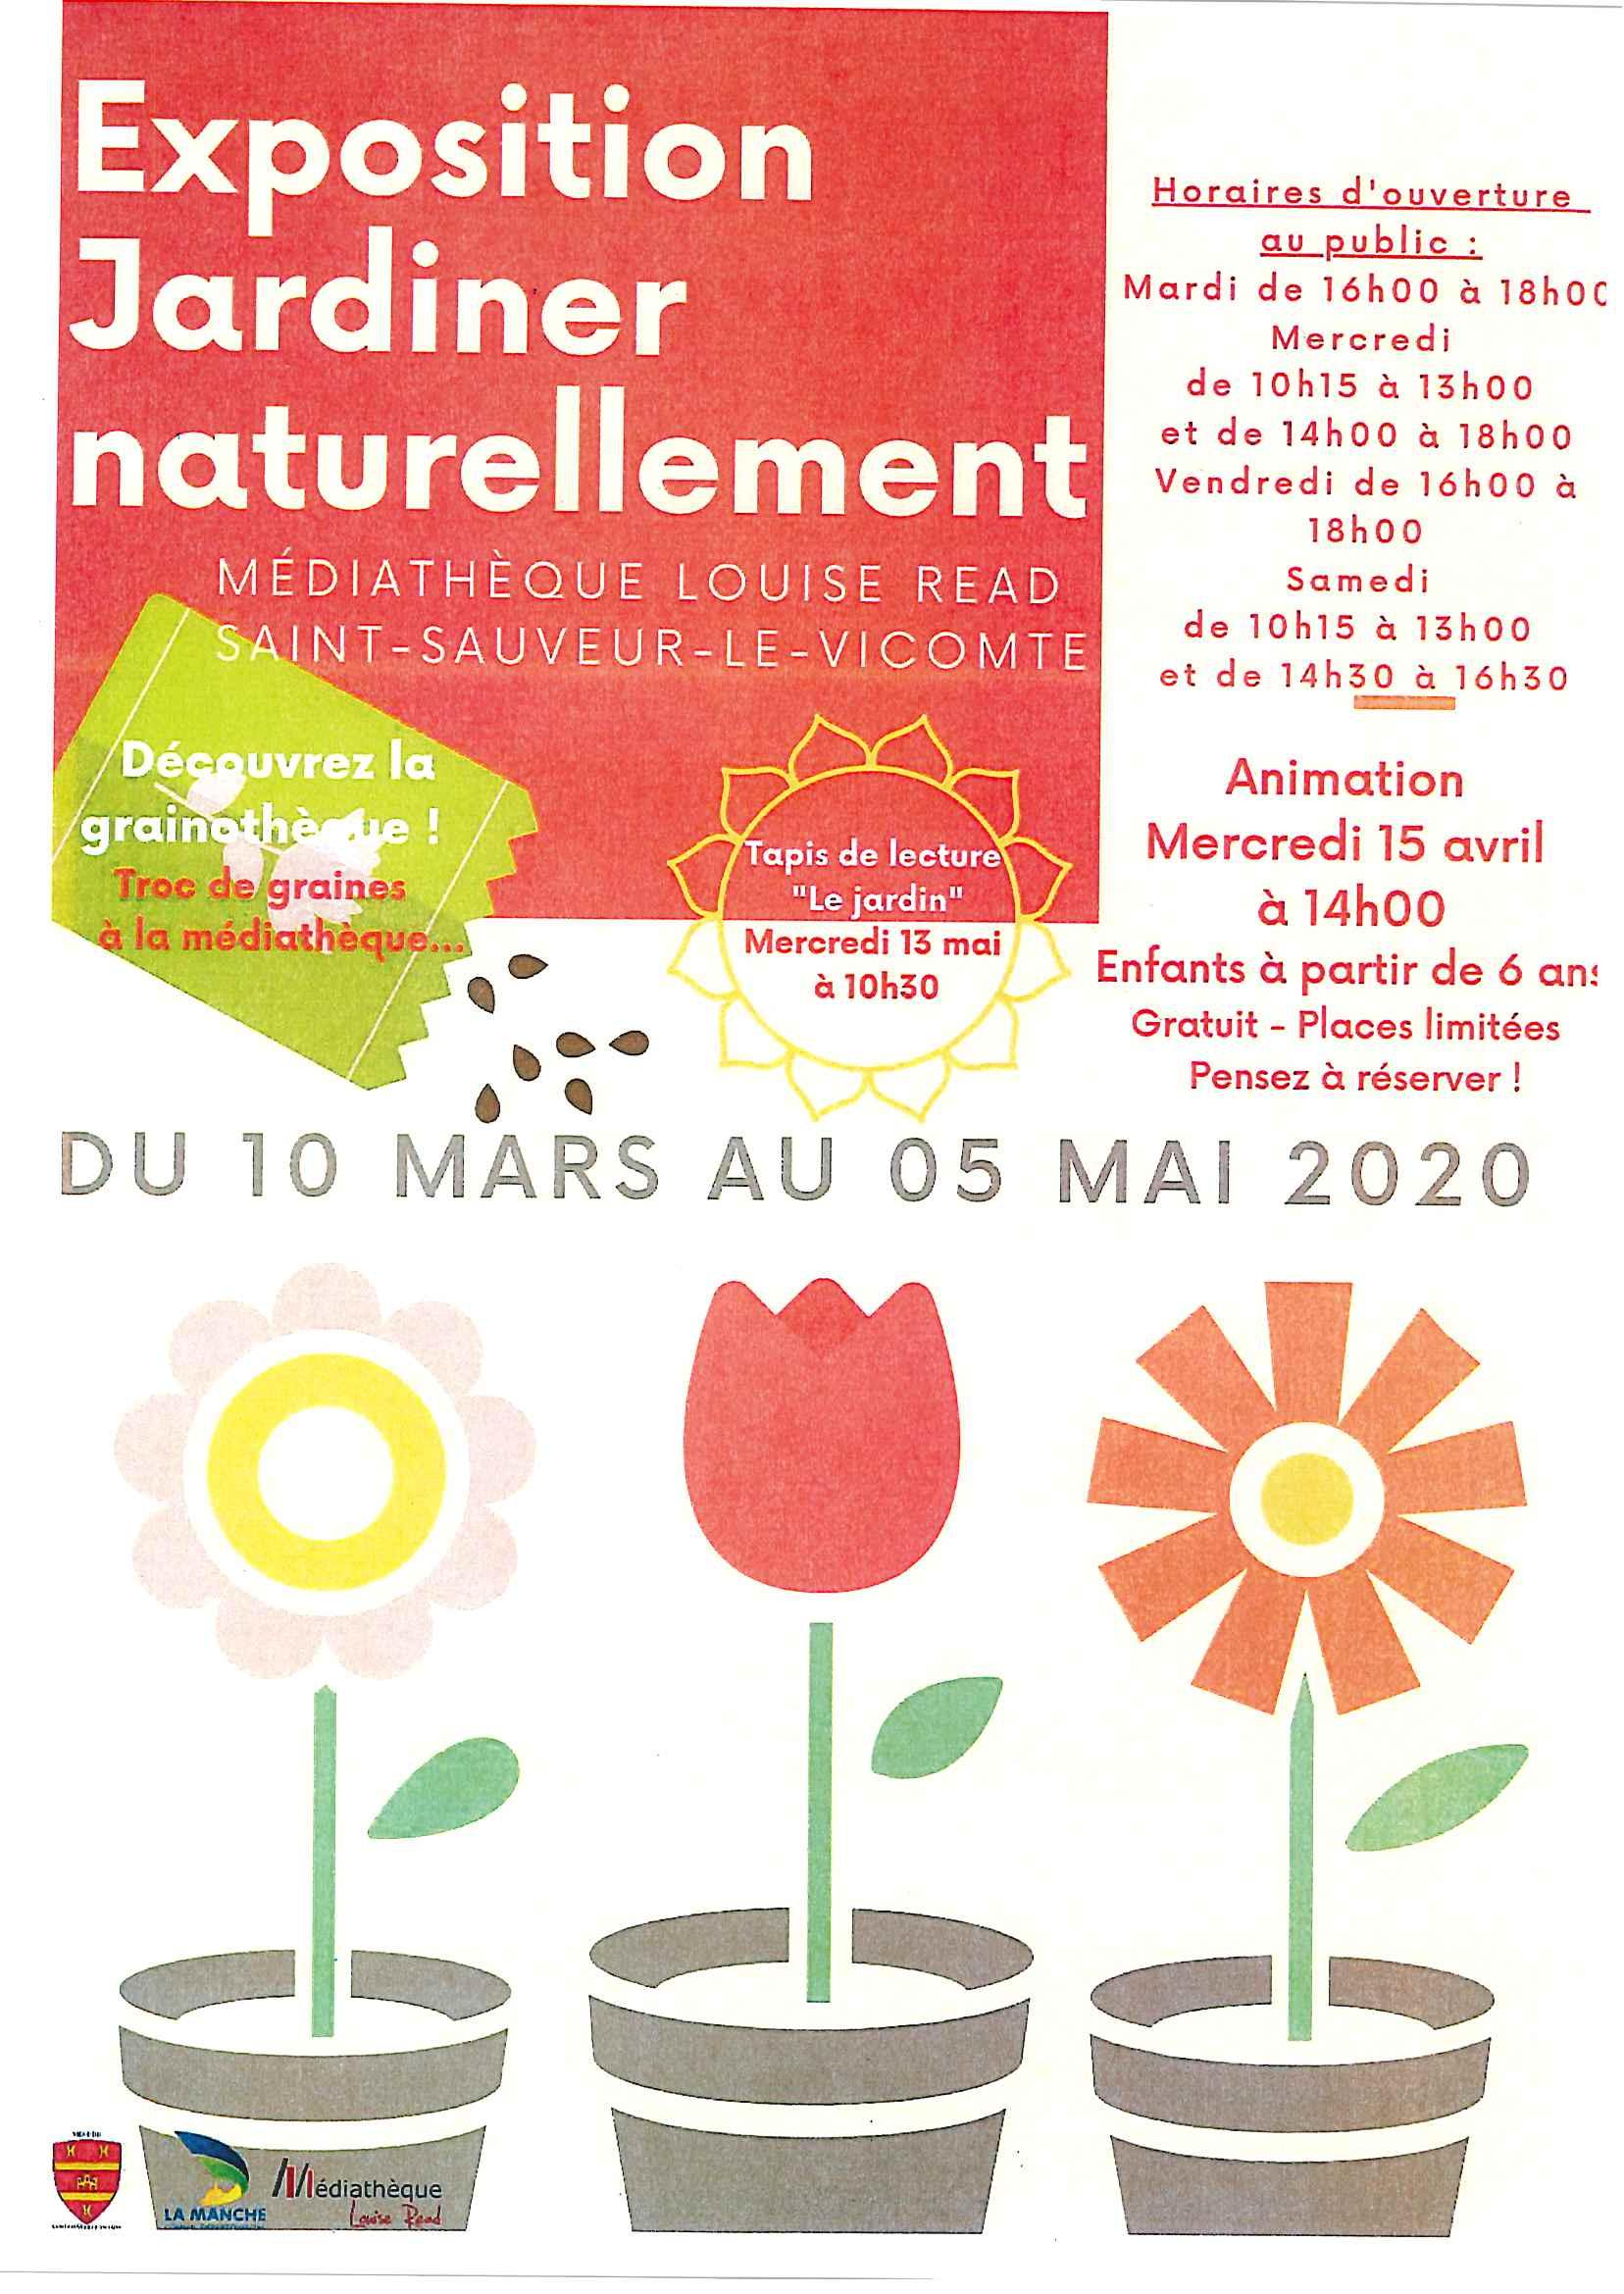 Exposition «Jardiner naturellement»  du 10 mars au 5 mai